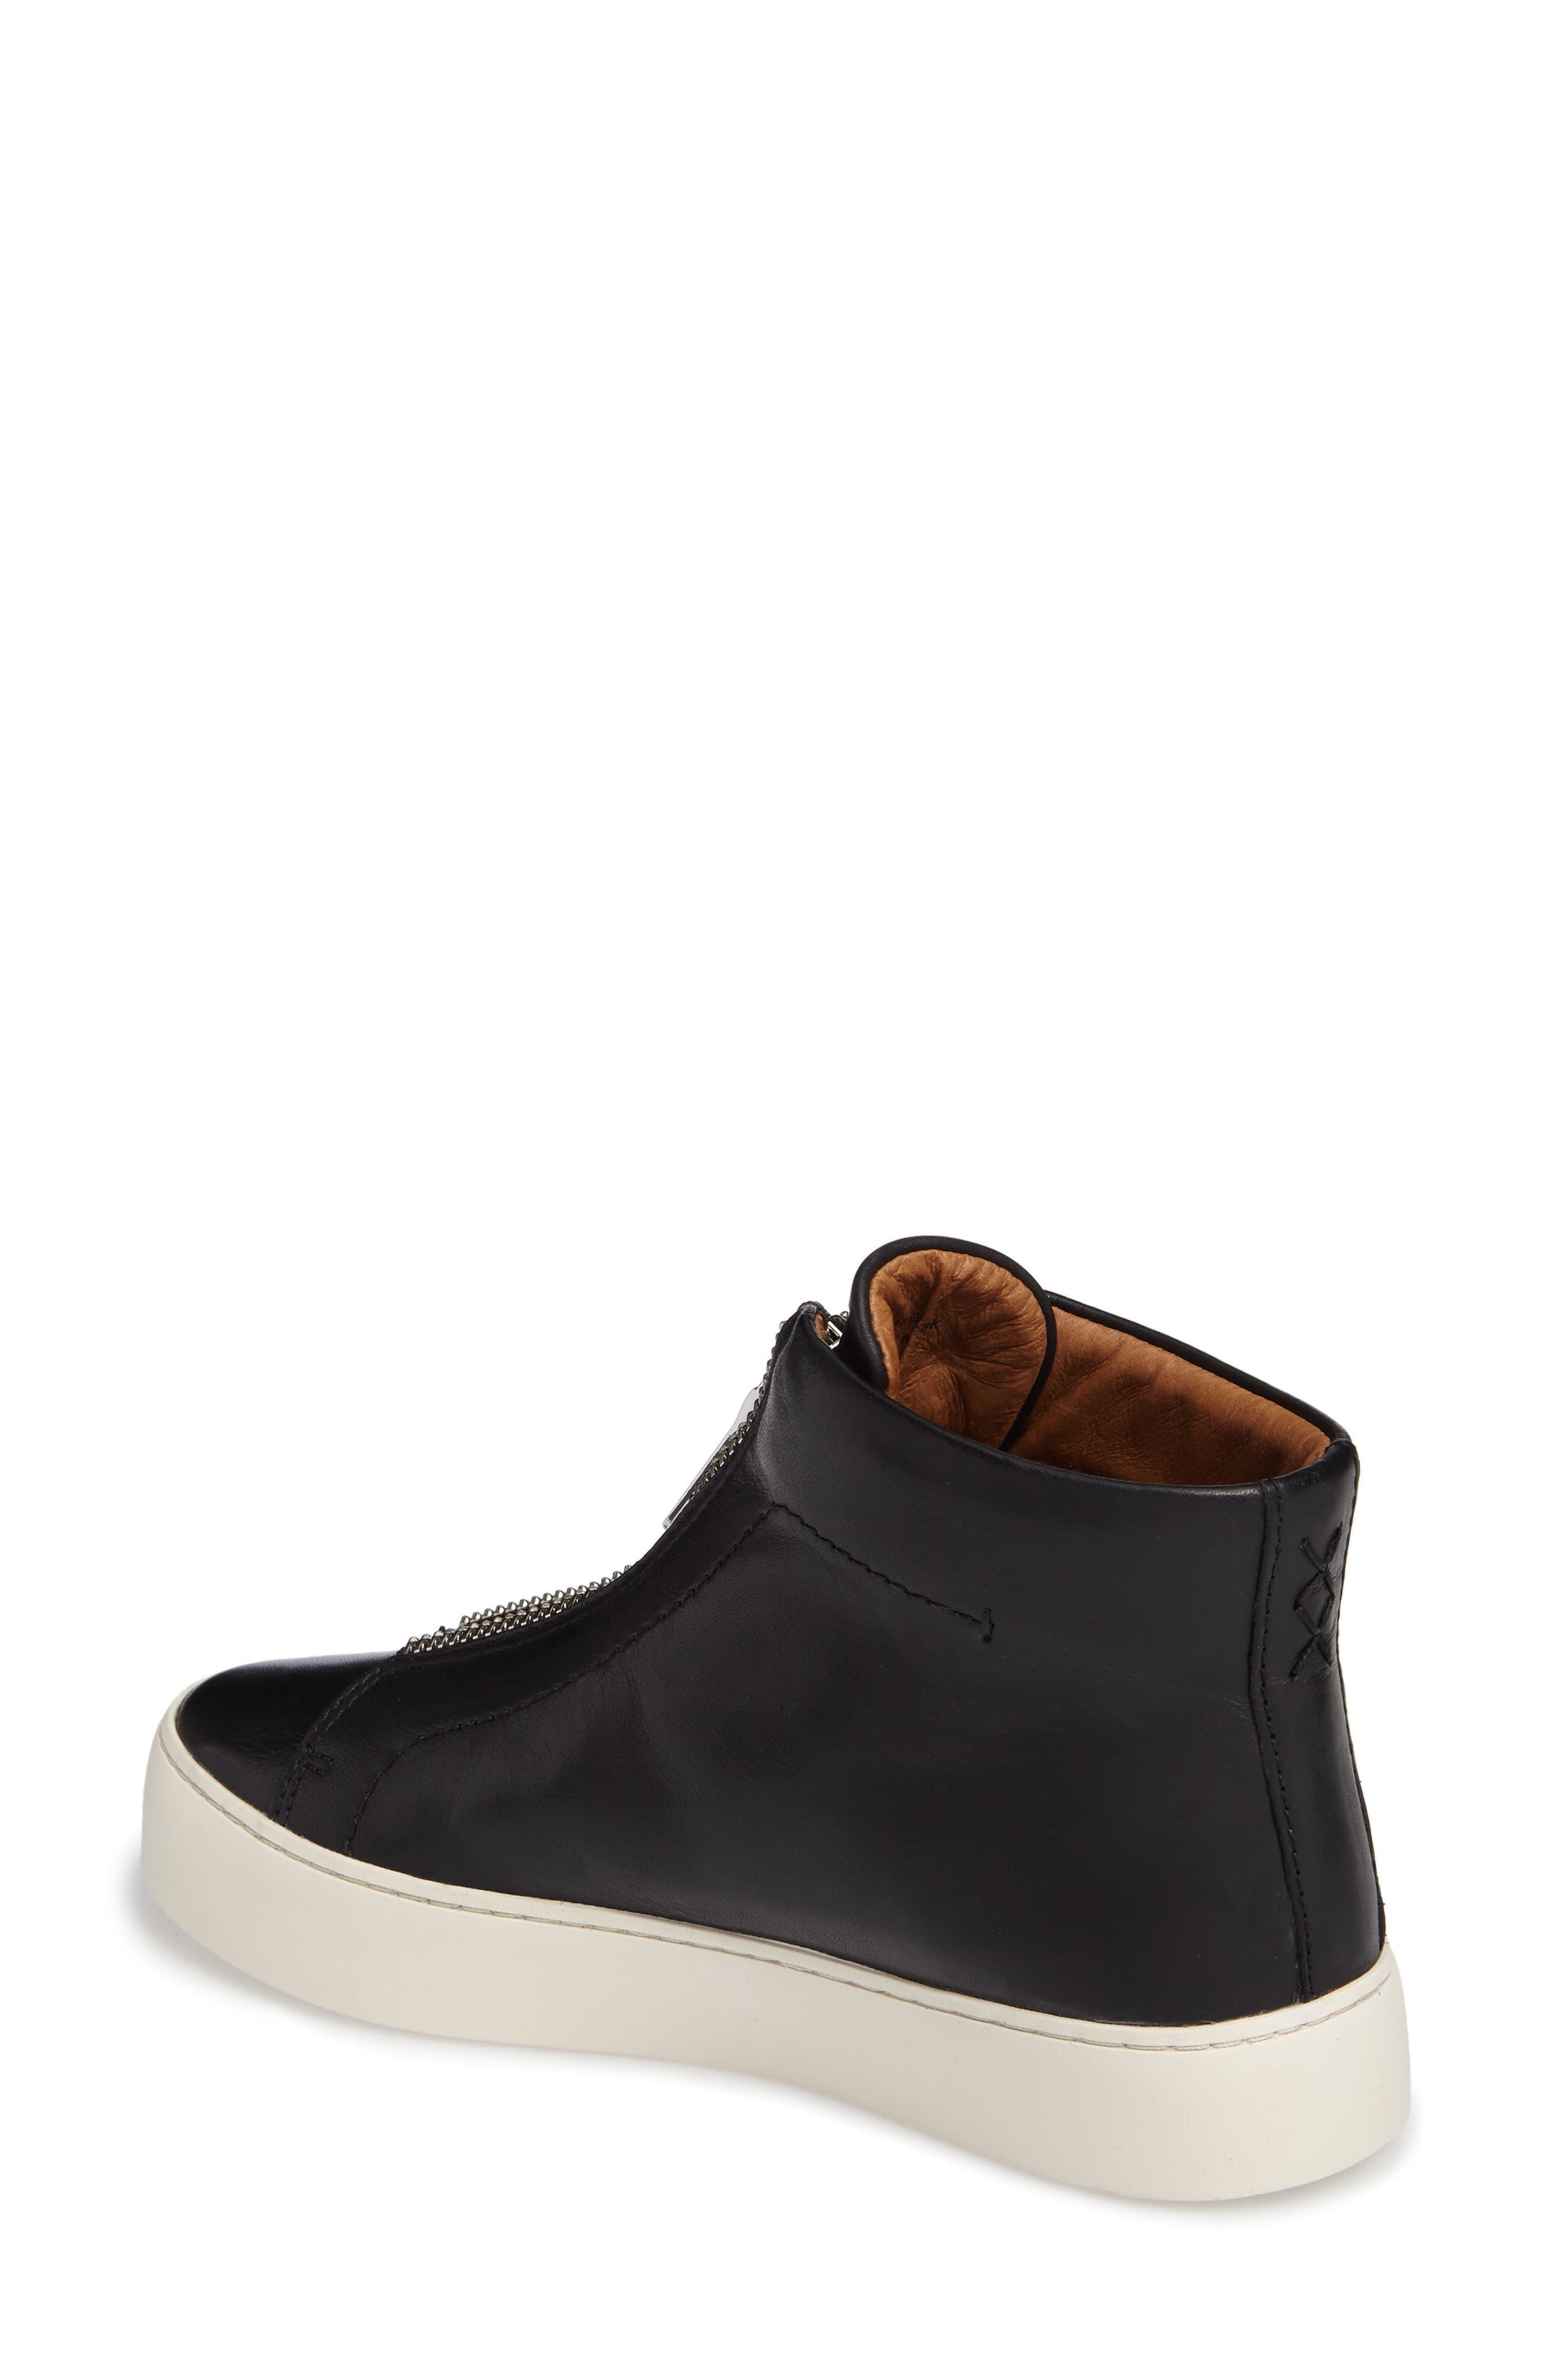 Lena Zip High Top Sneaker,                             Alternate thumbnail 2, color,                             BLACK LEATHER